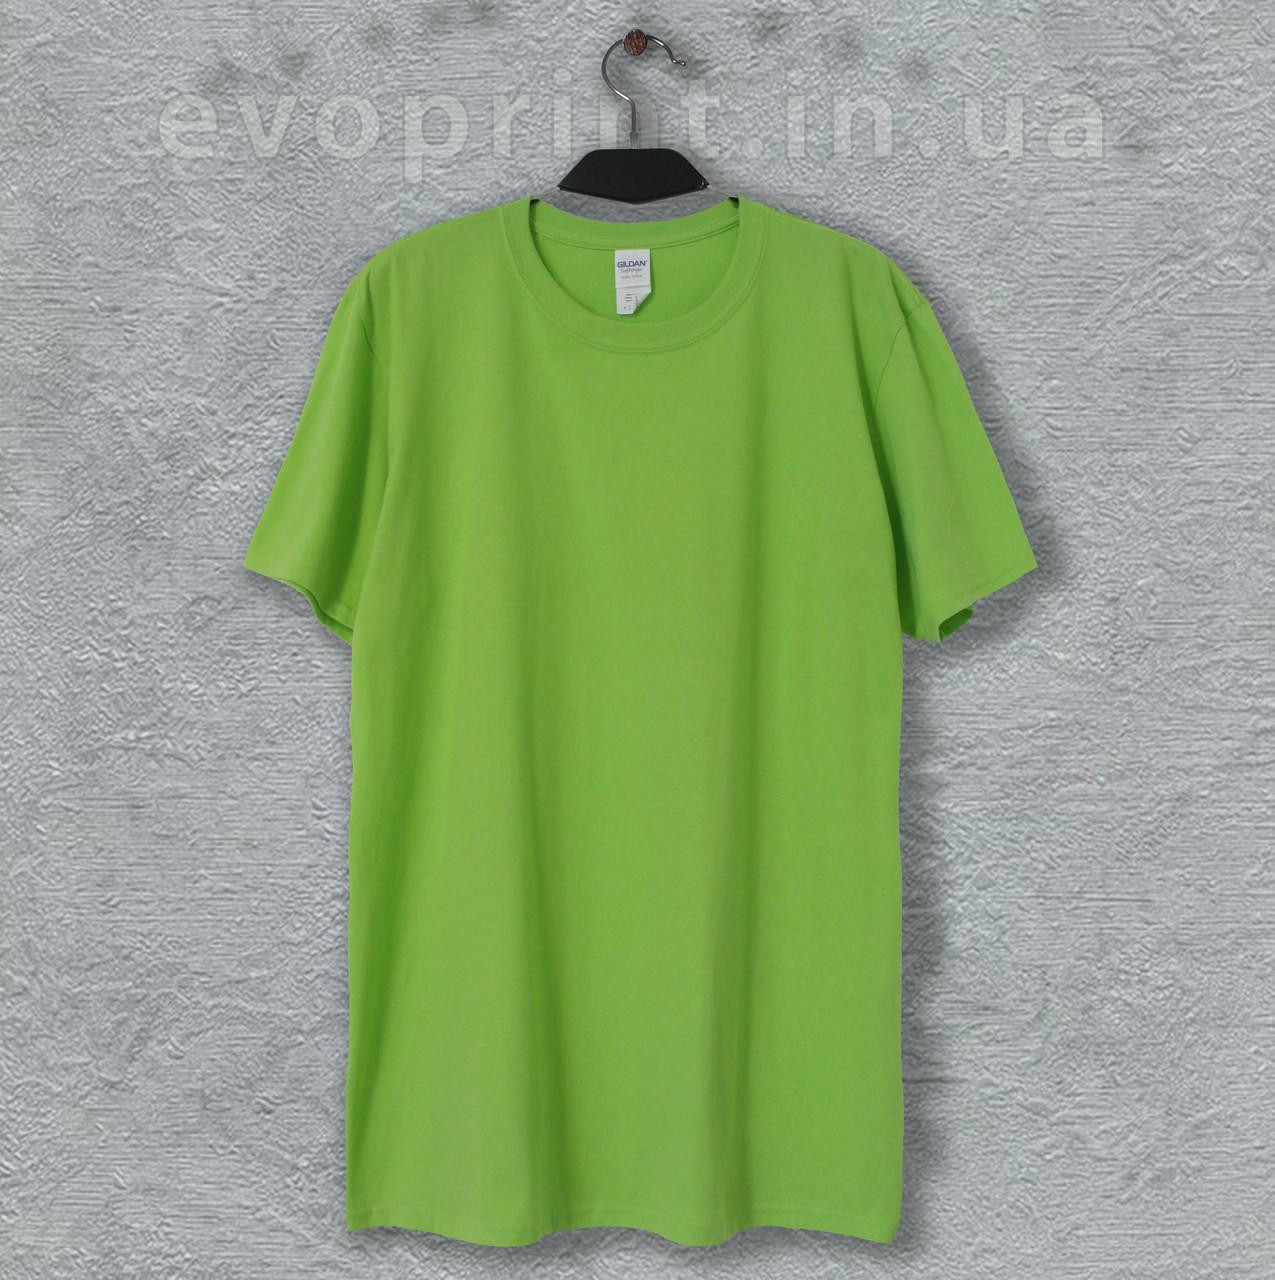 Футболка однотонная мужская ярко зеленая